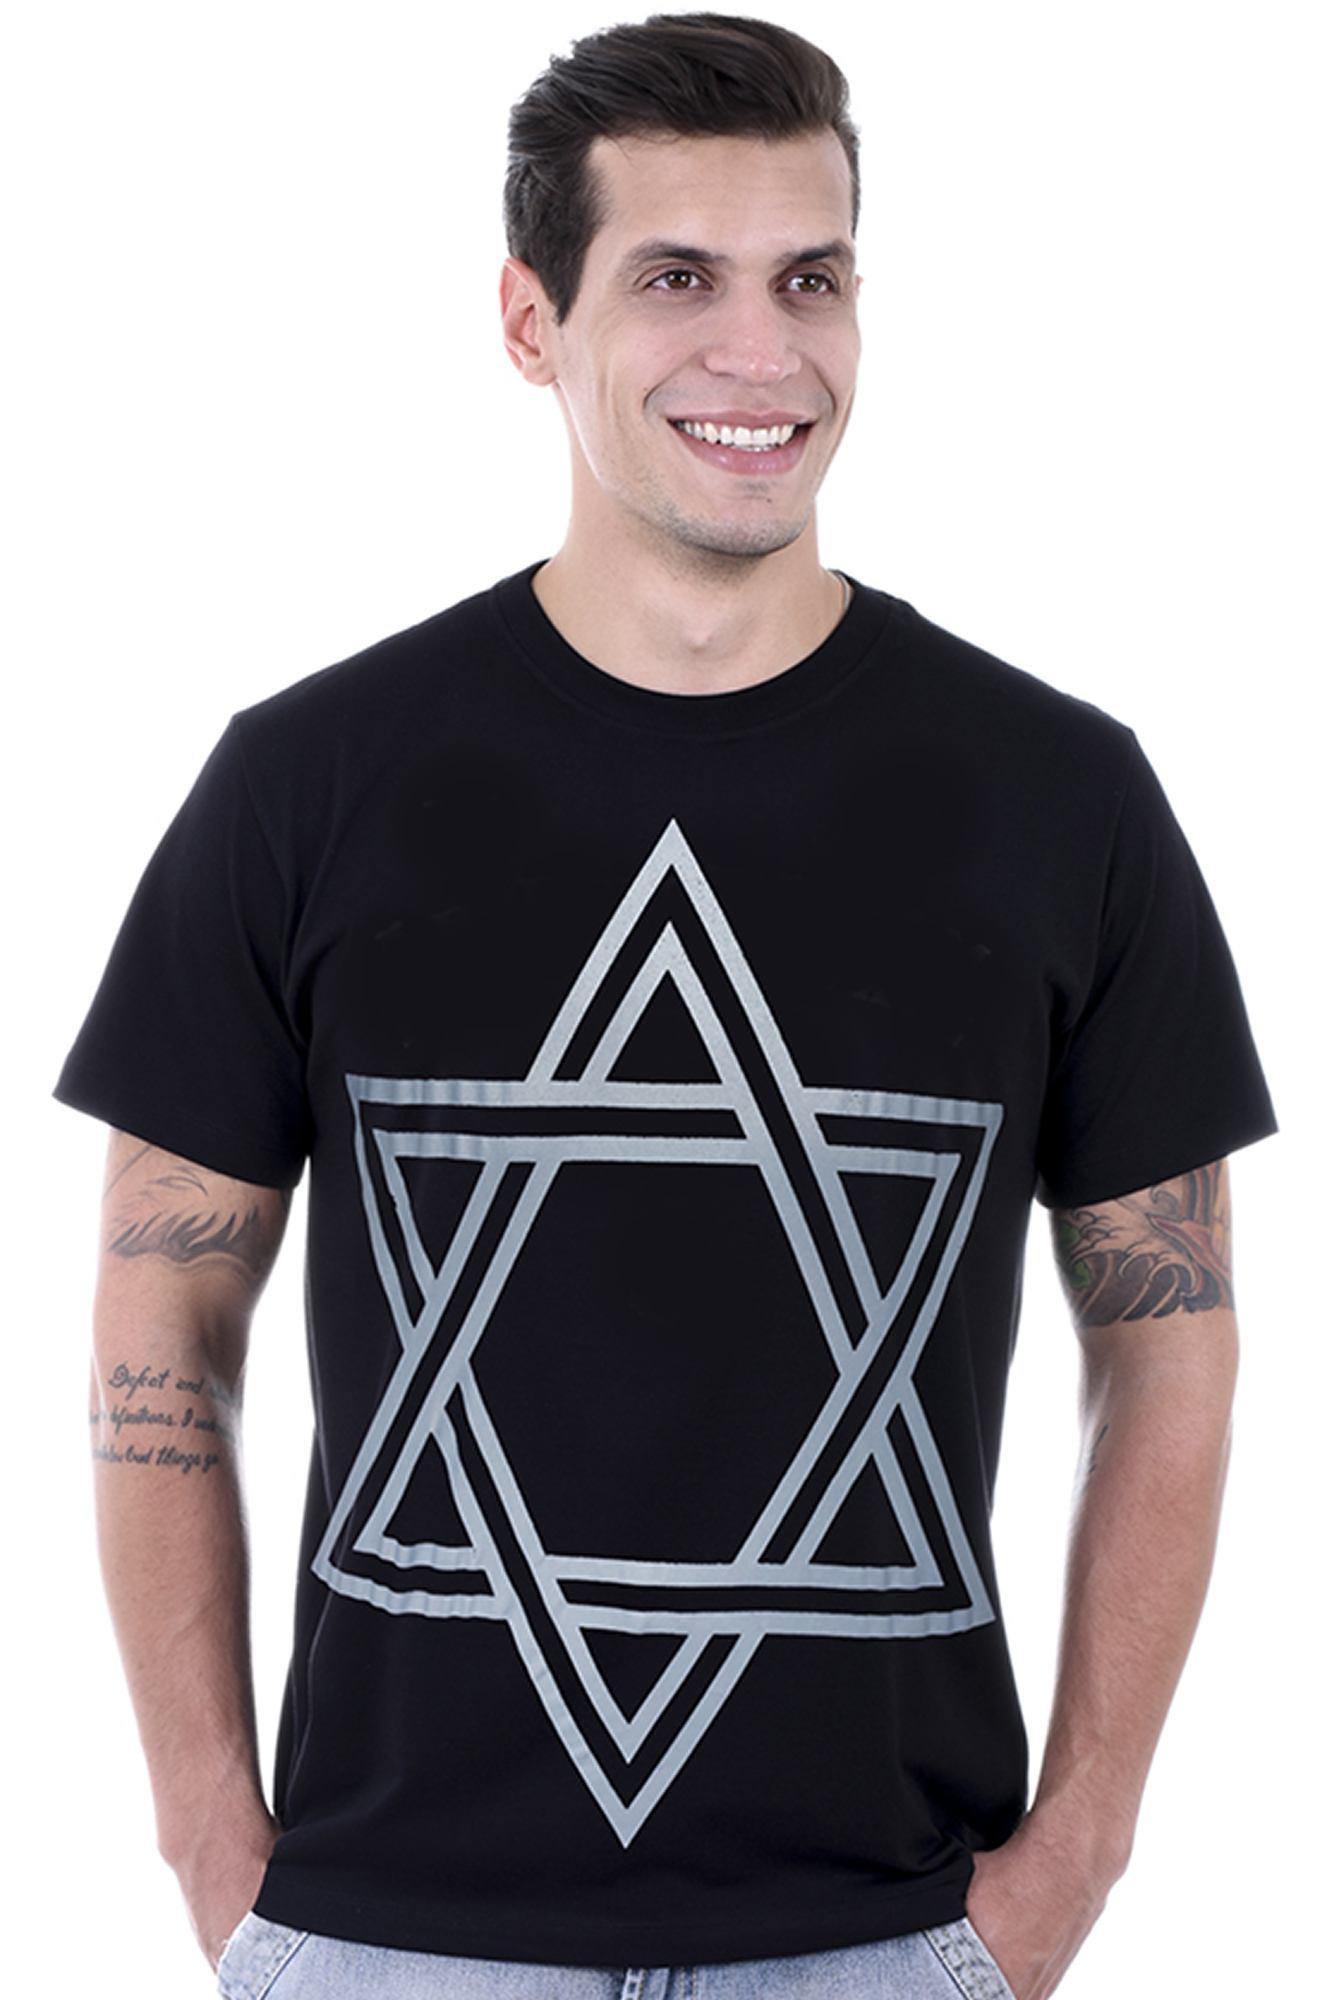 Camiseta Masculina Estampada Estrela  de Davi Preto Hardivision